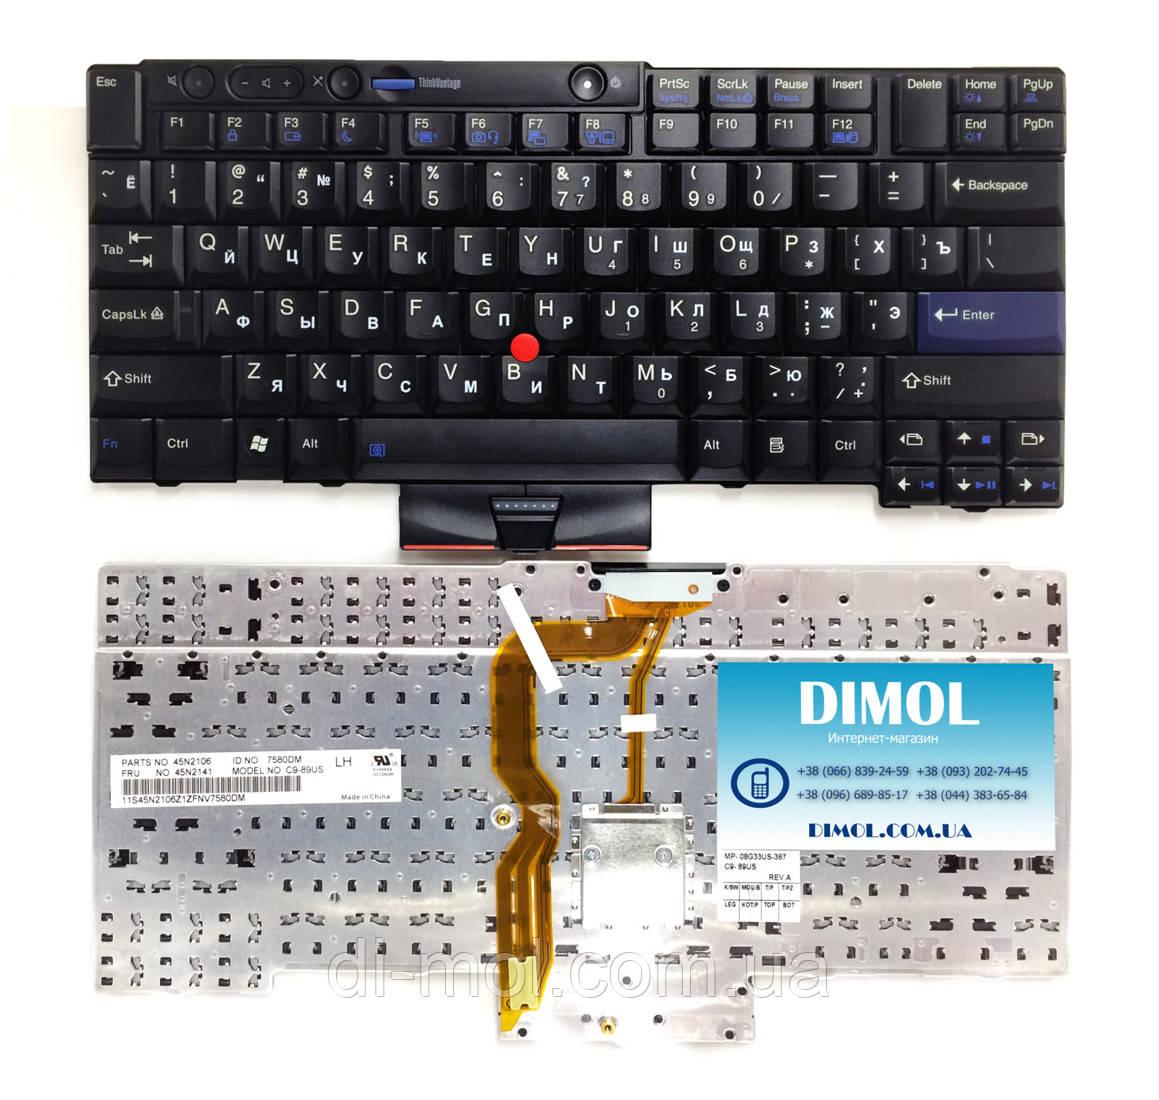 Оригинальная клавиатура для ноутбука Lenovo ThinkPad T400S series, ru, black